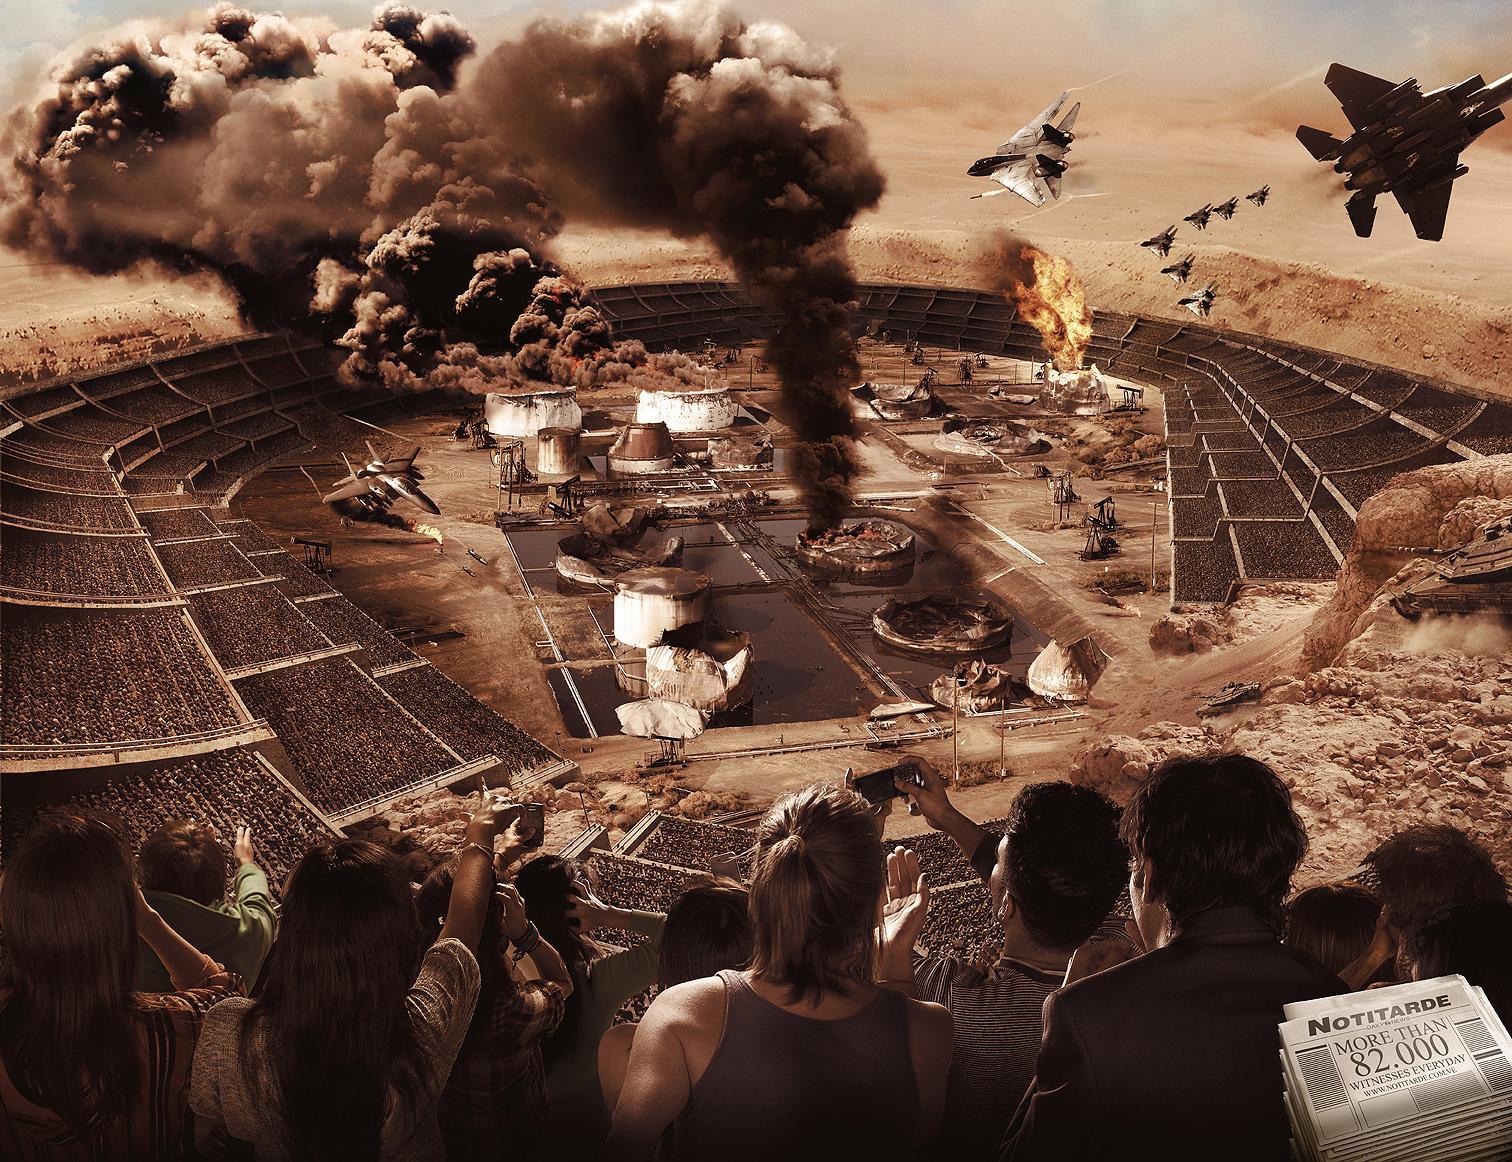 Notitarde Print Ad -  Witnesses, Desert Storm